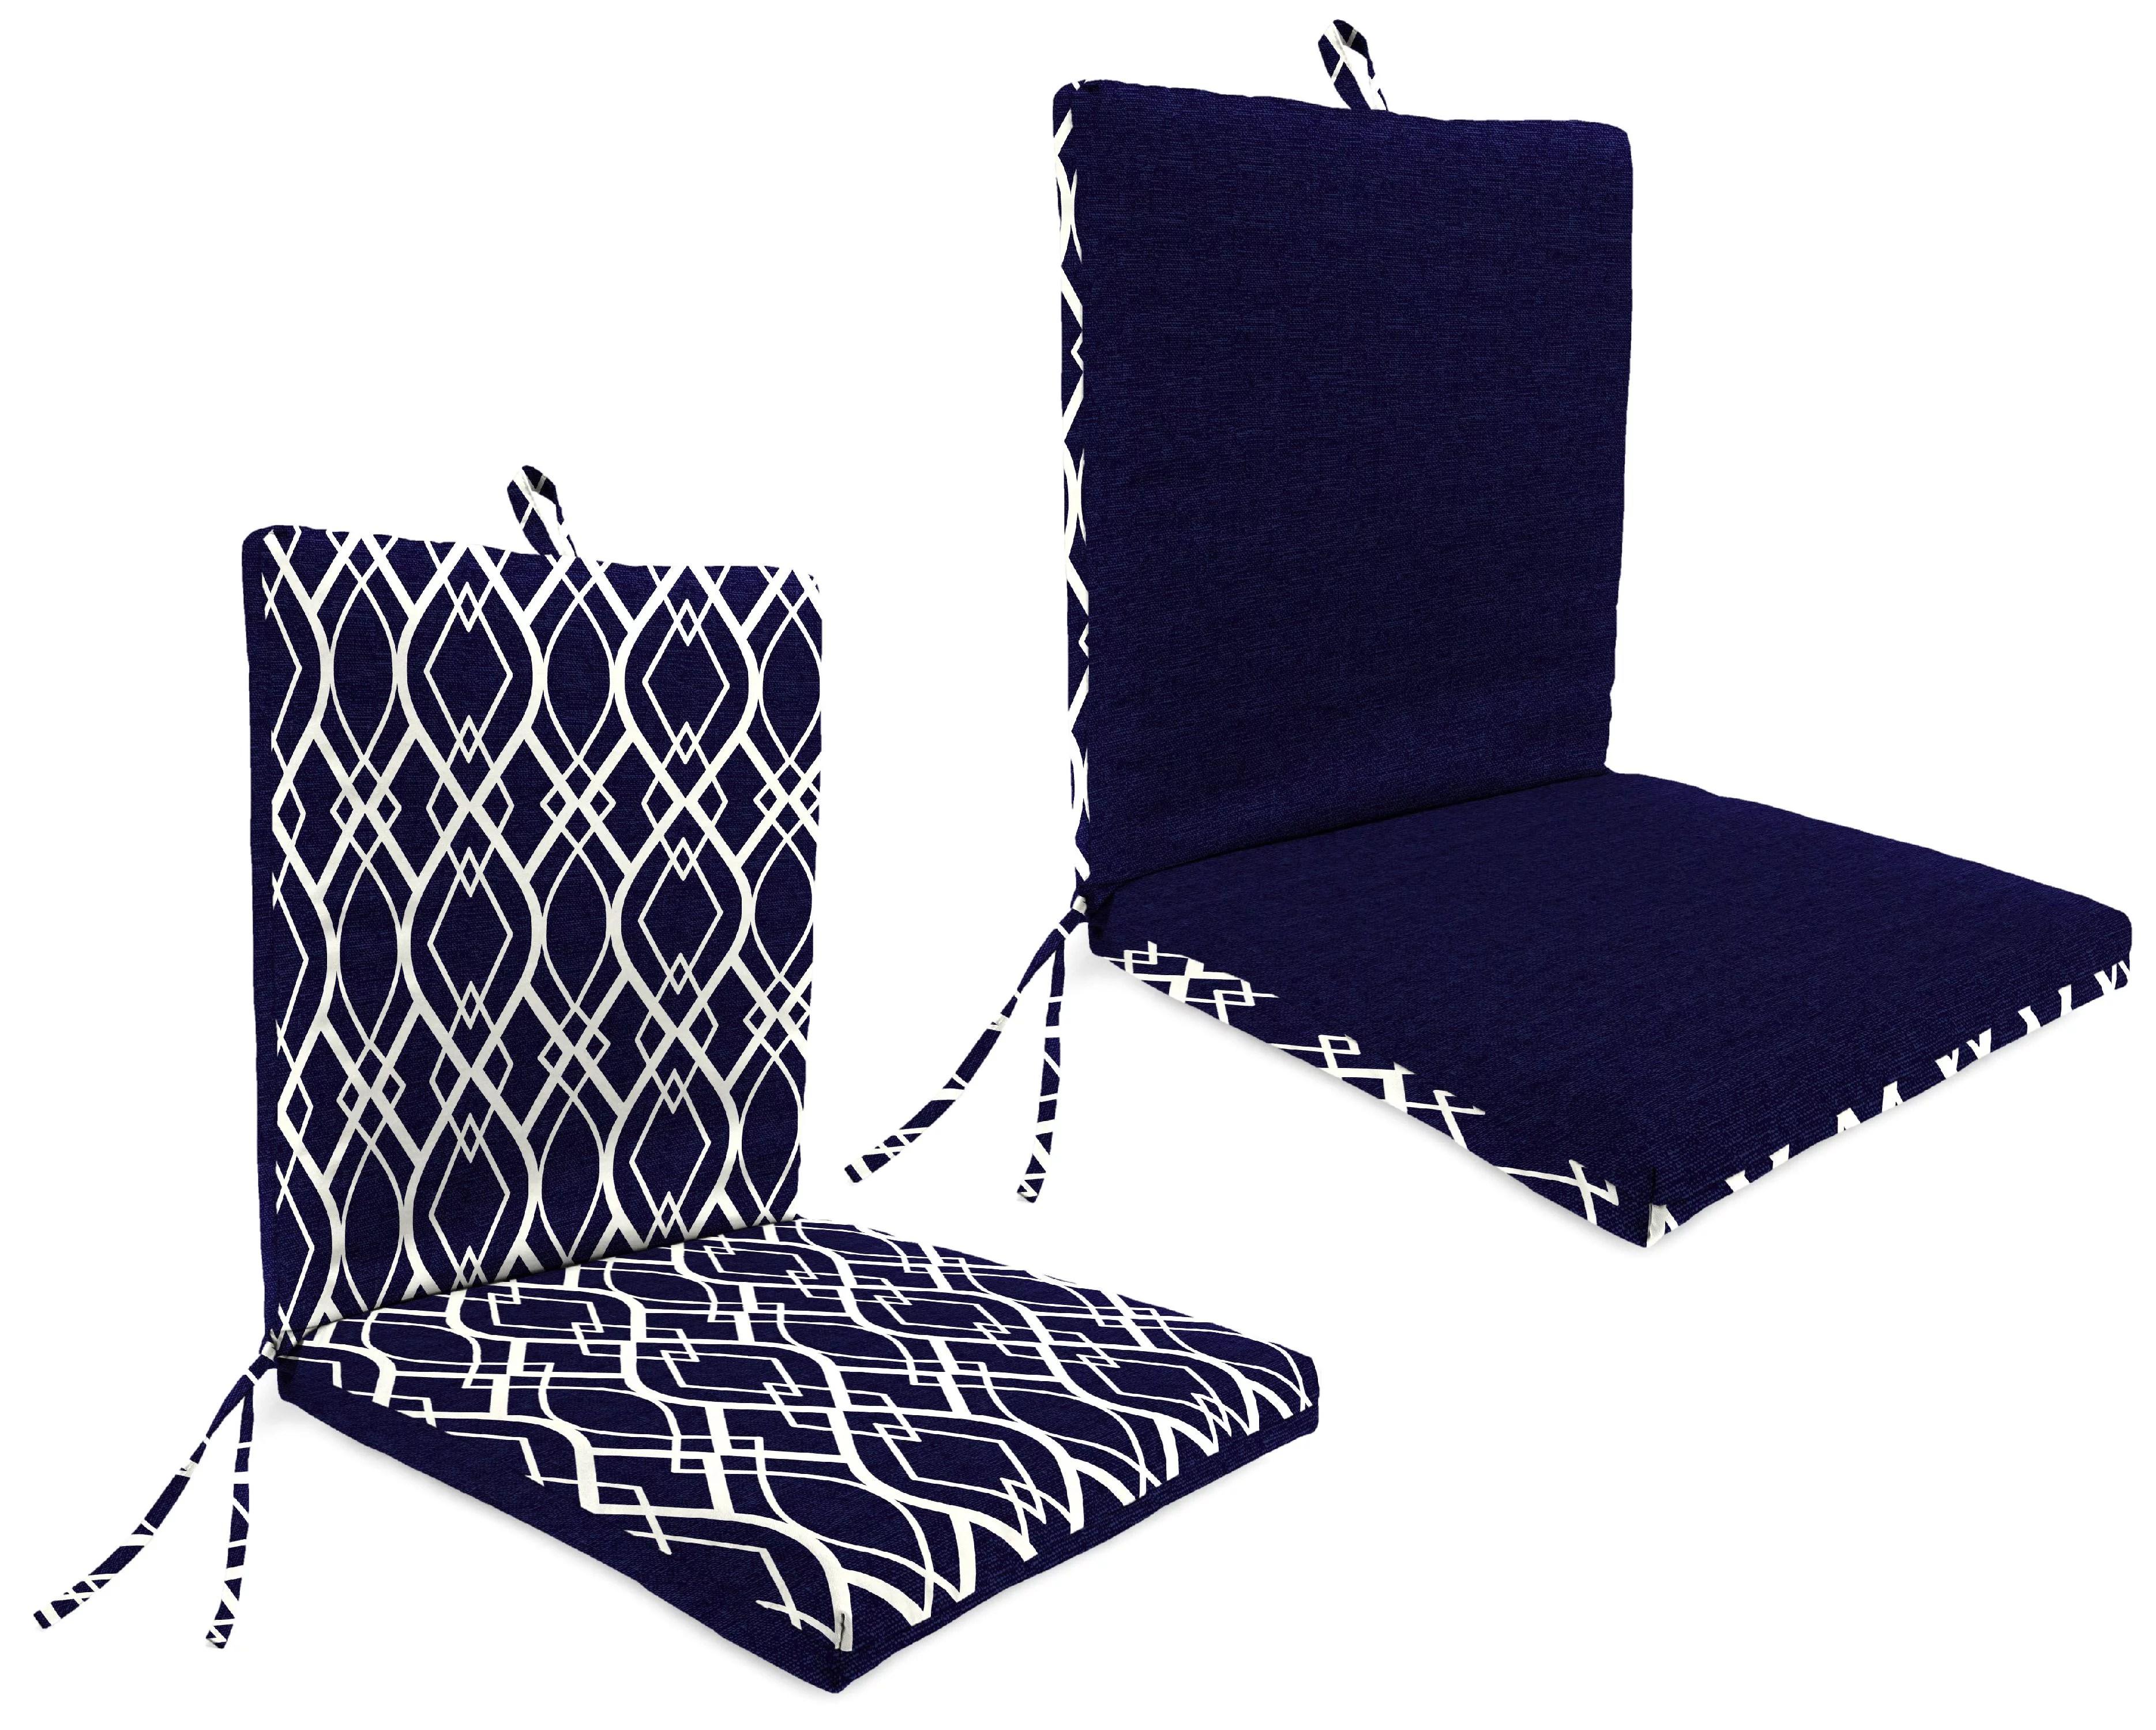 mainstays 1 piece outdoor chair cushion navy trellis